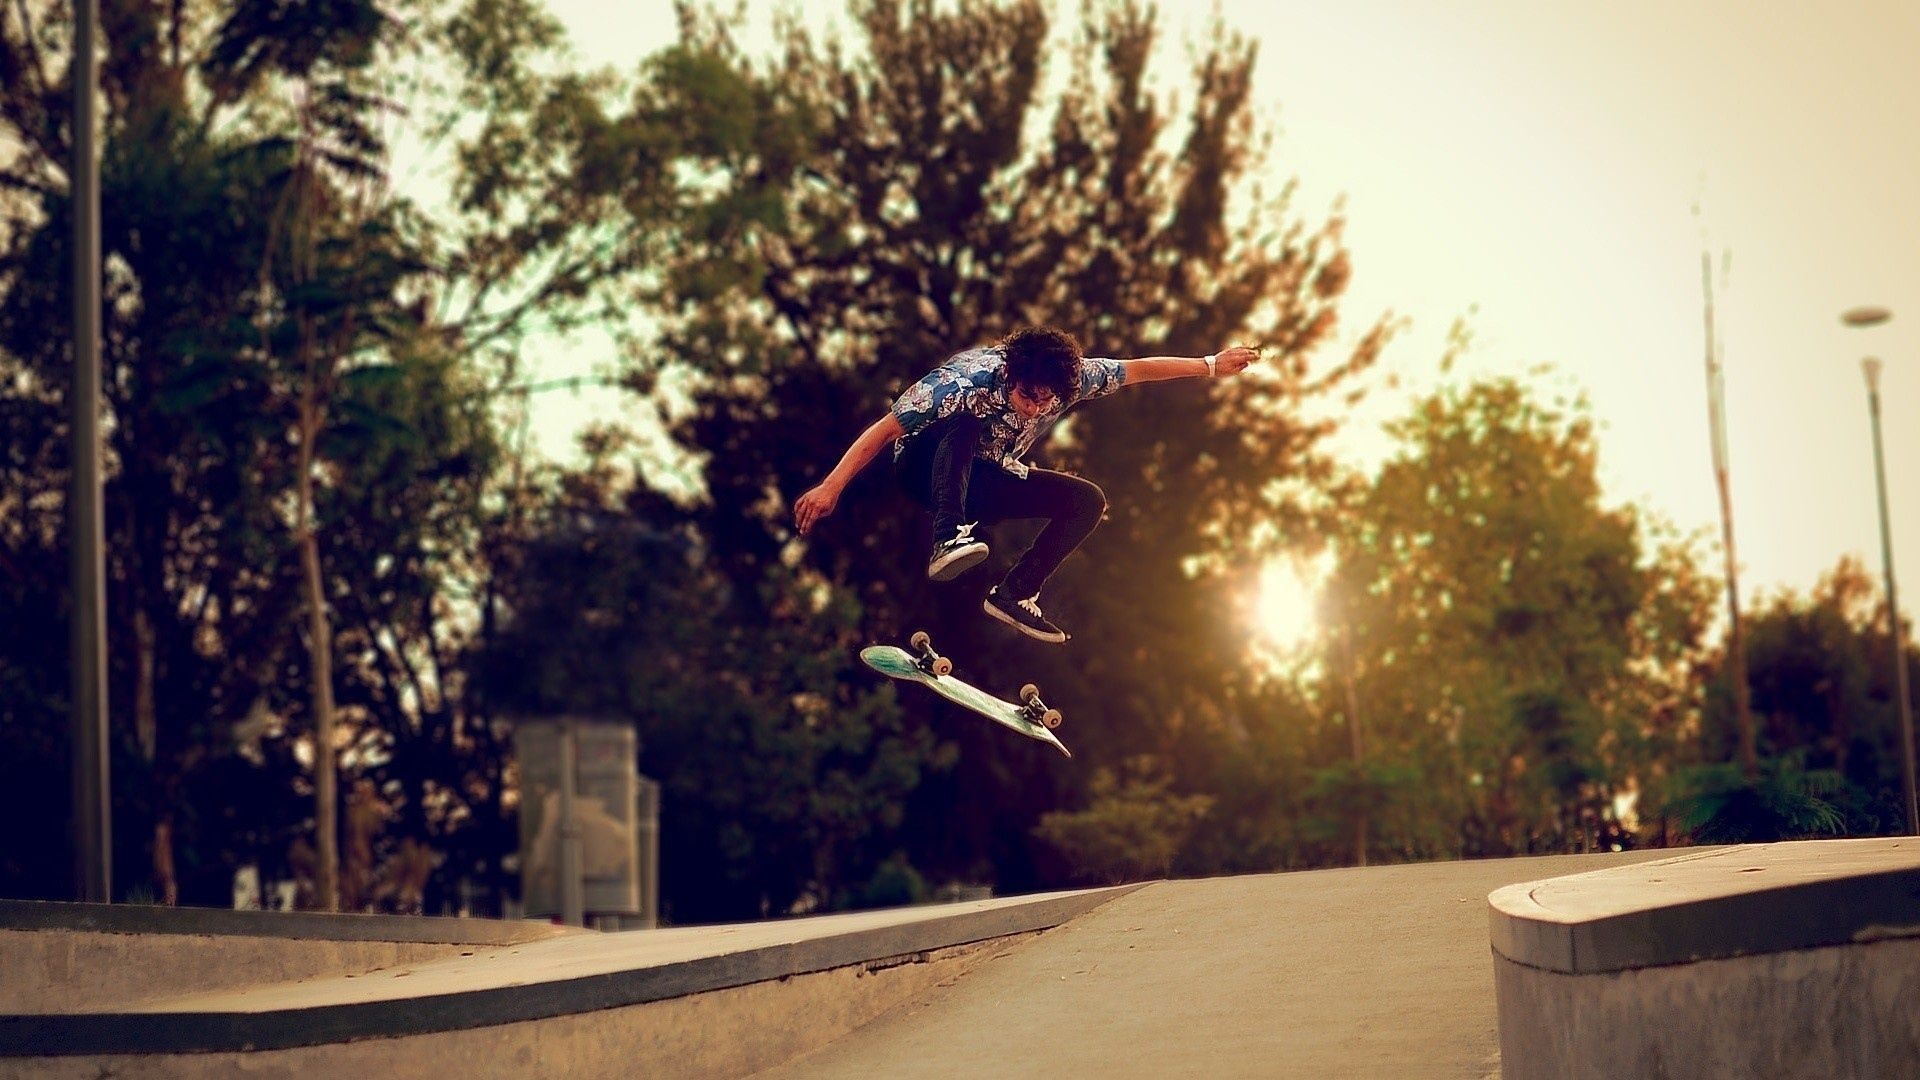 Download Wallpaper 1920x1080 Trees Skateboard Boy Skate Street Full Hd 1080p Hd Background Skateboard Cool Skateboards Skateboard Pictures